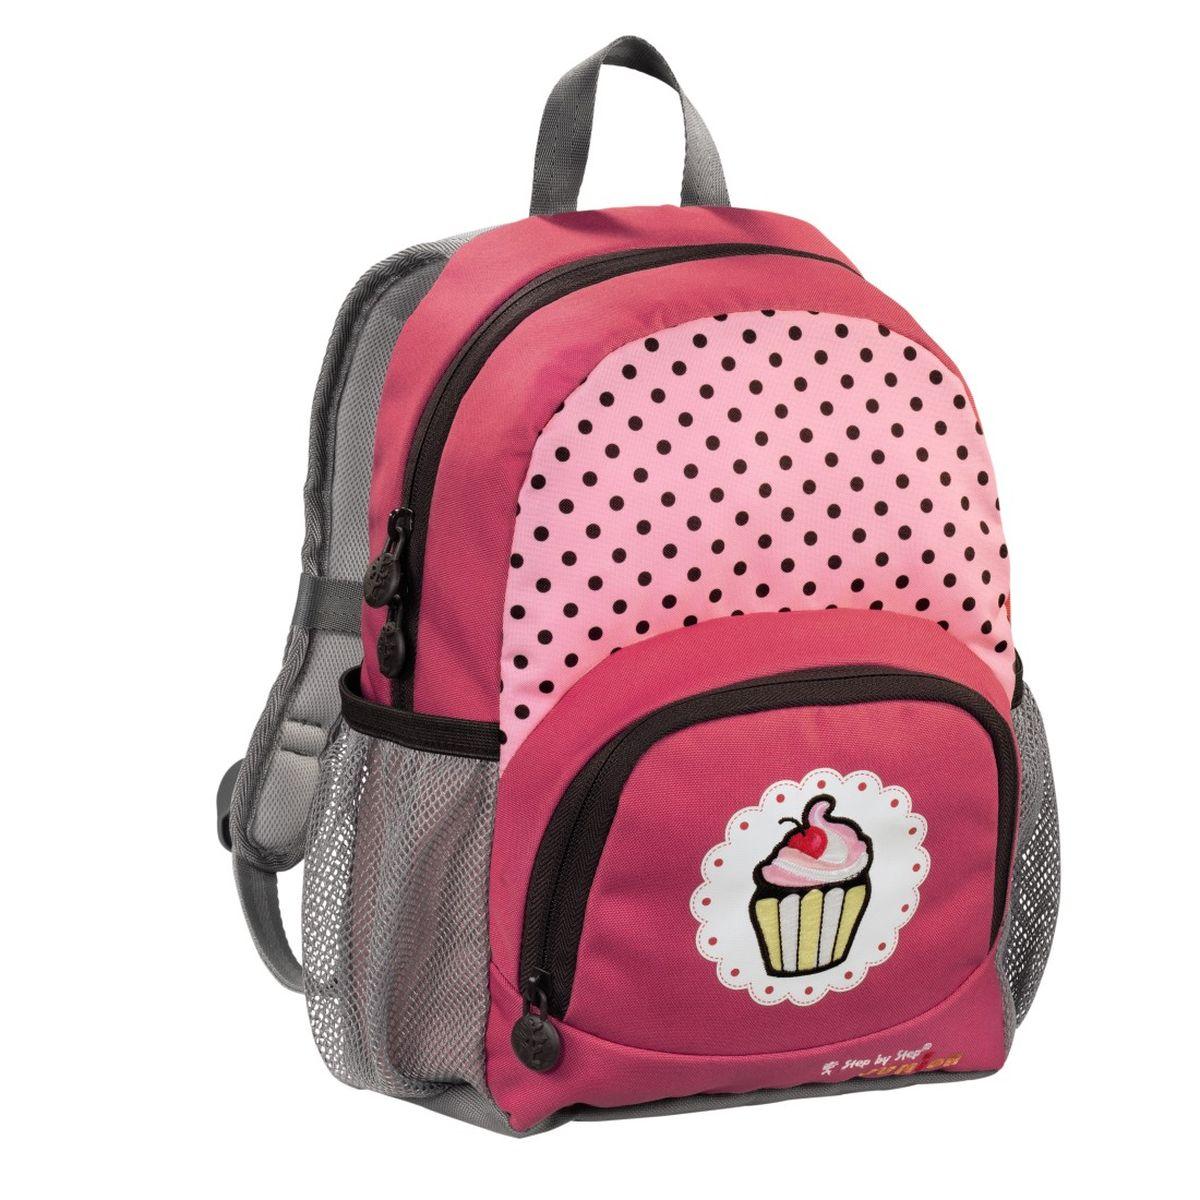 Hama Рюкзак детский Step By Step Junior Dressy Sweet Cake138406Рюкзак детский Step By Step Junior Dressy Sweet cake красный/серый